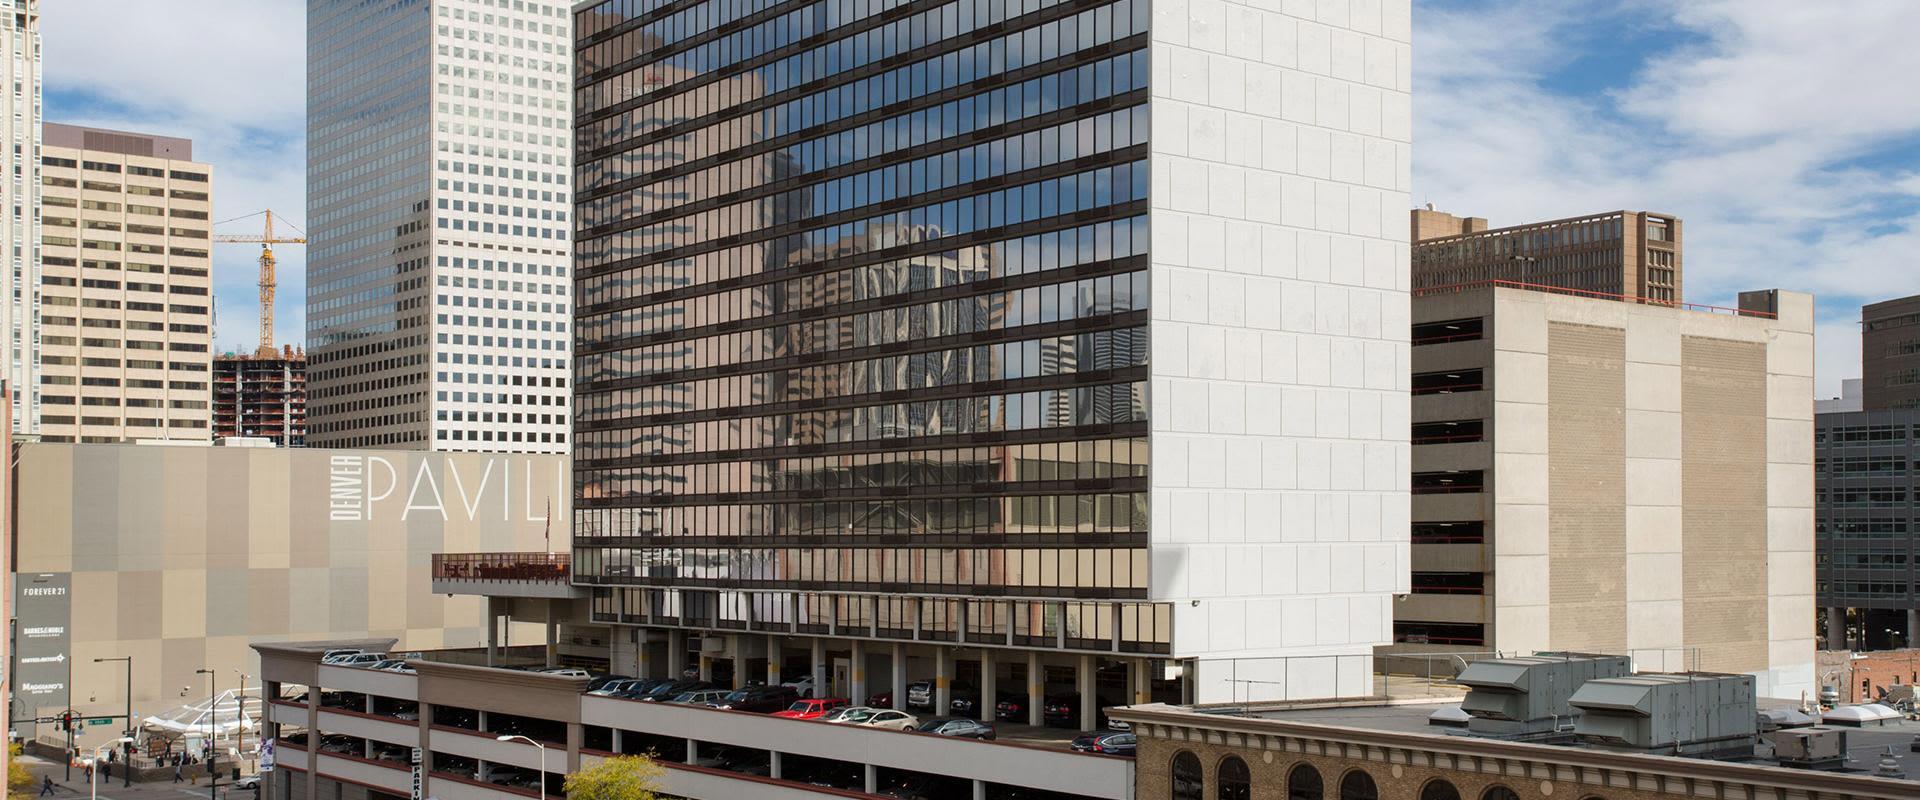 Denver Hotel Exterior With Skyscrapers